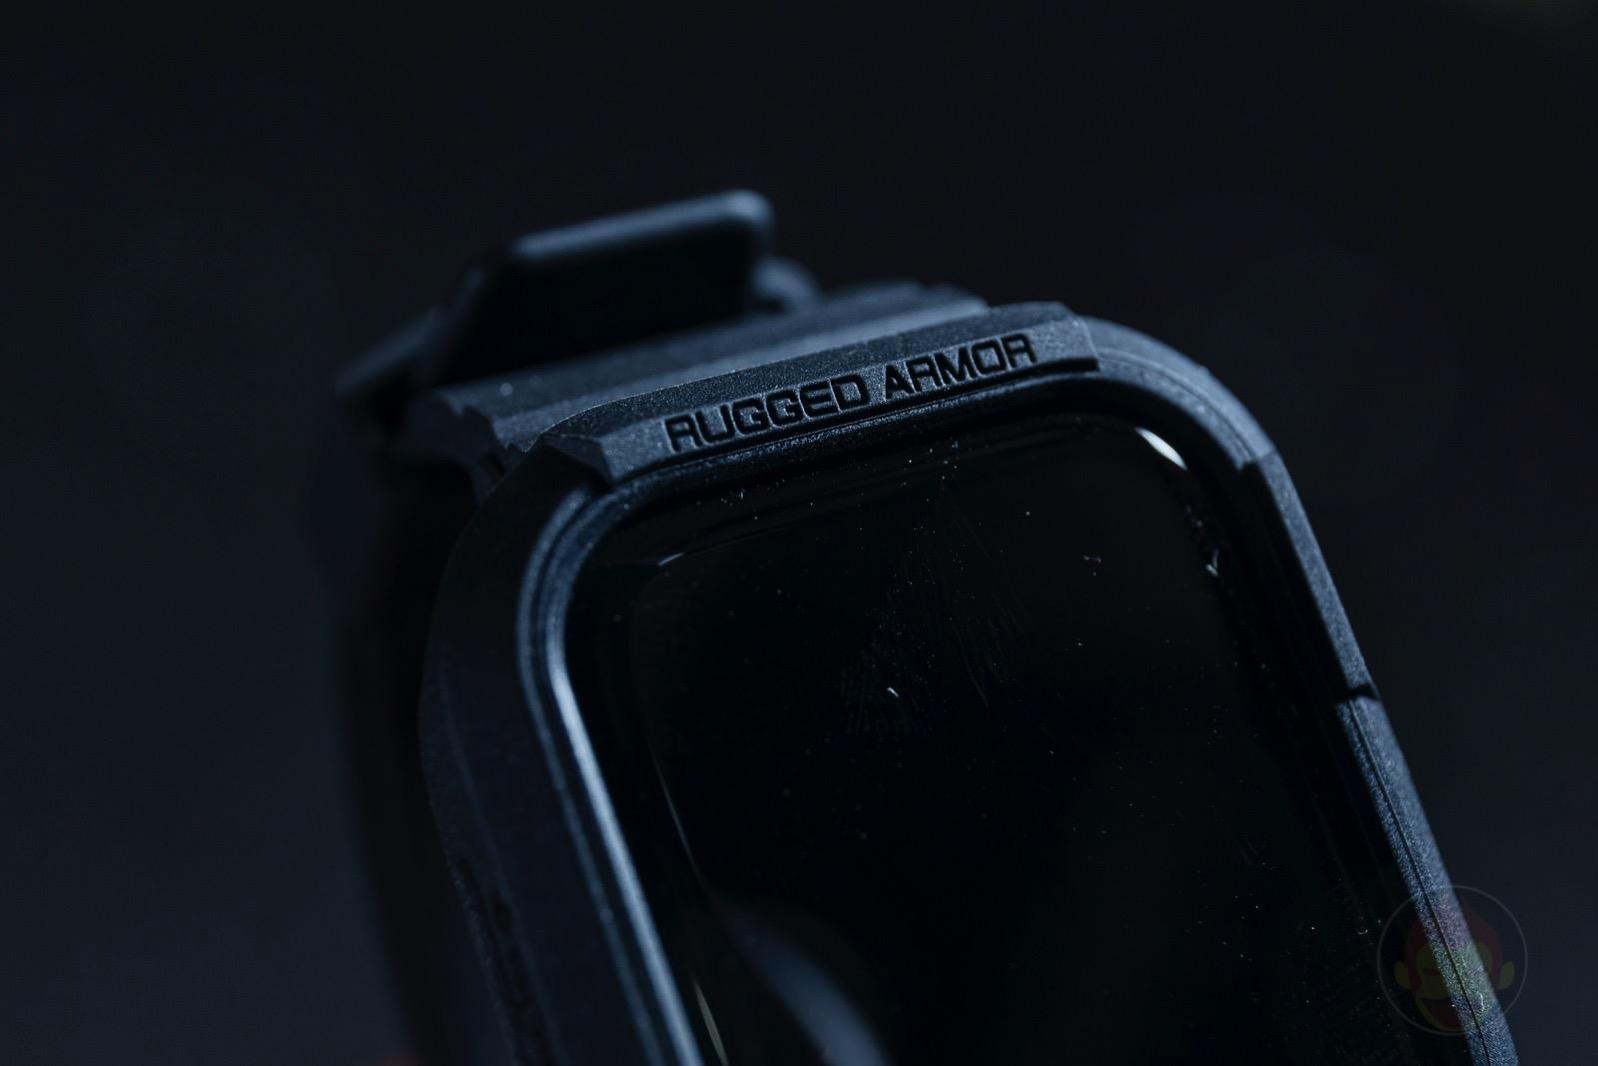 Spigen-Rugged-Armor-Pro-Apple-Watch-Band-and-case-06.jpg